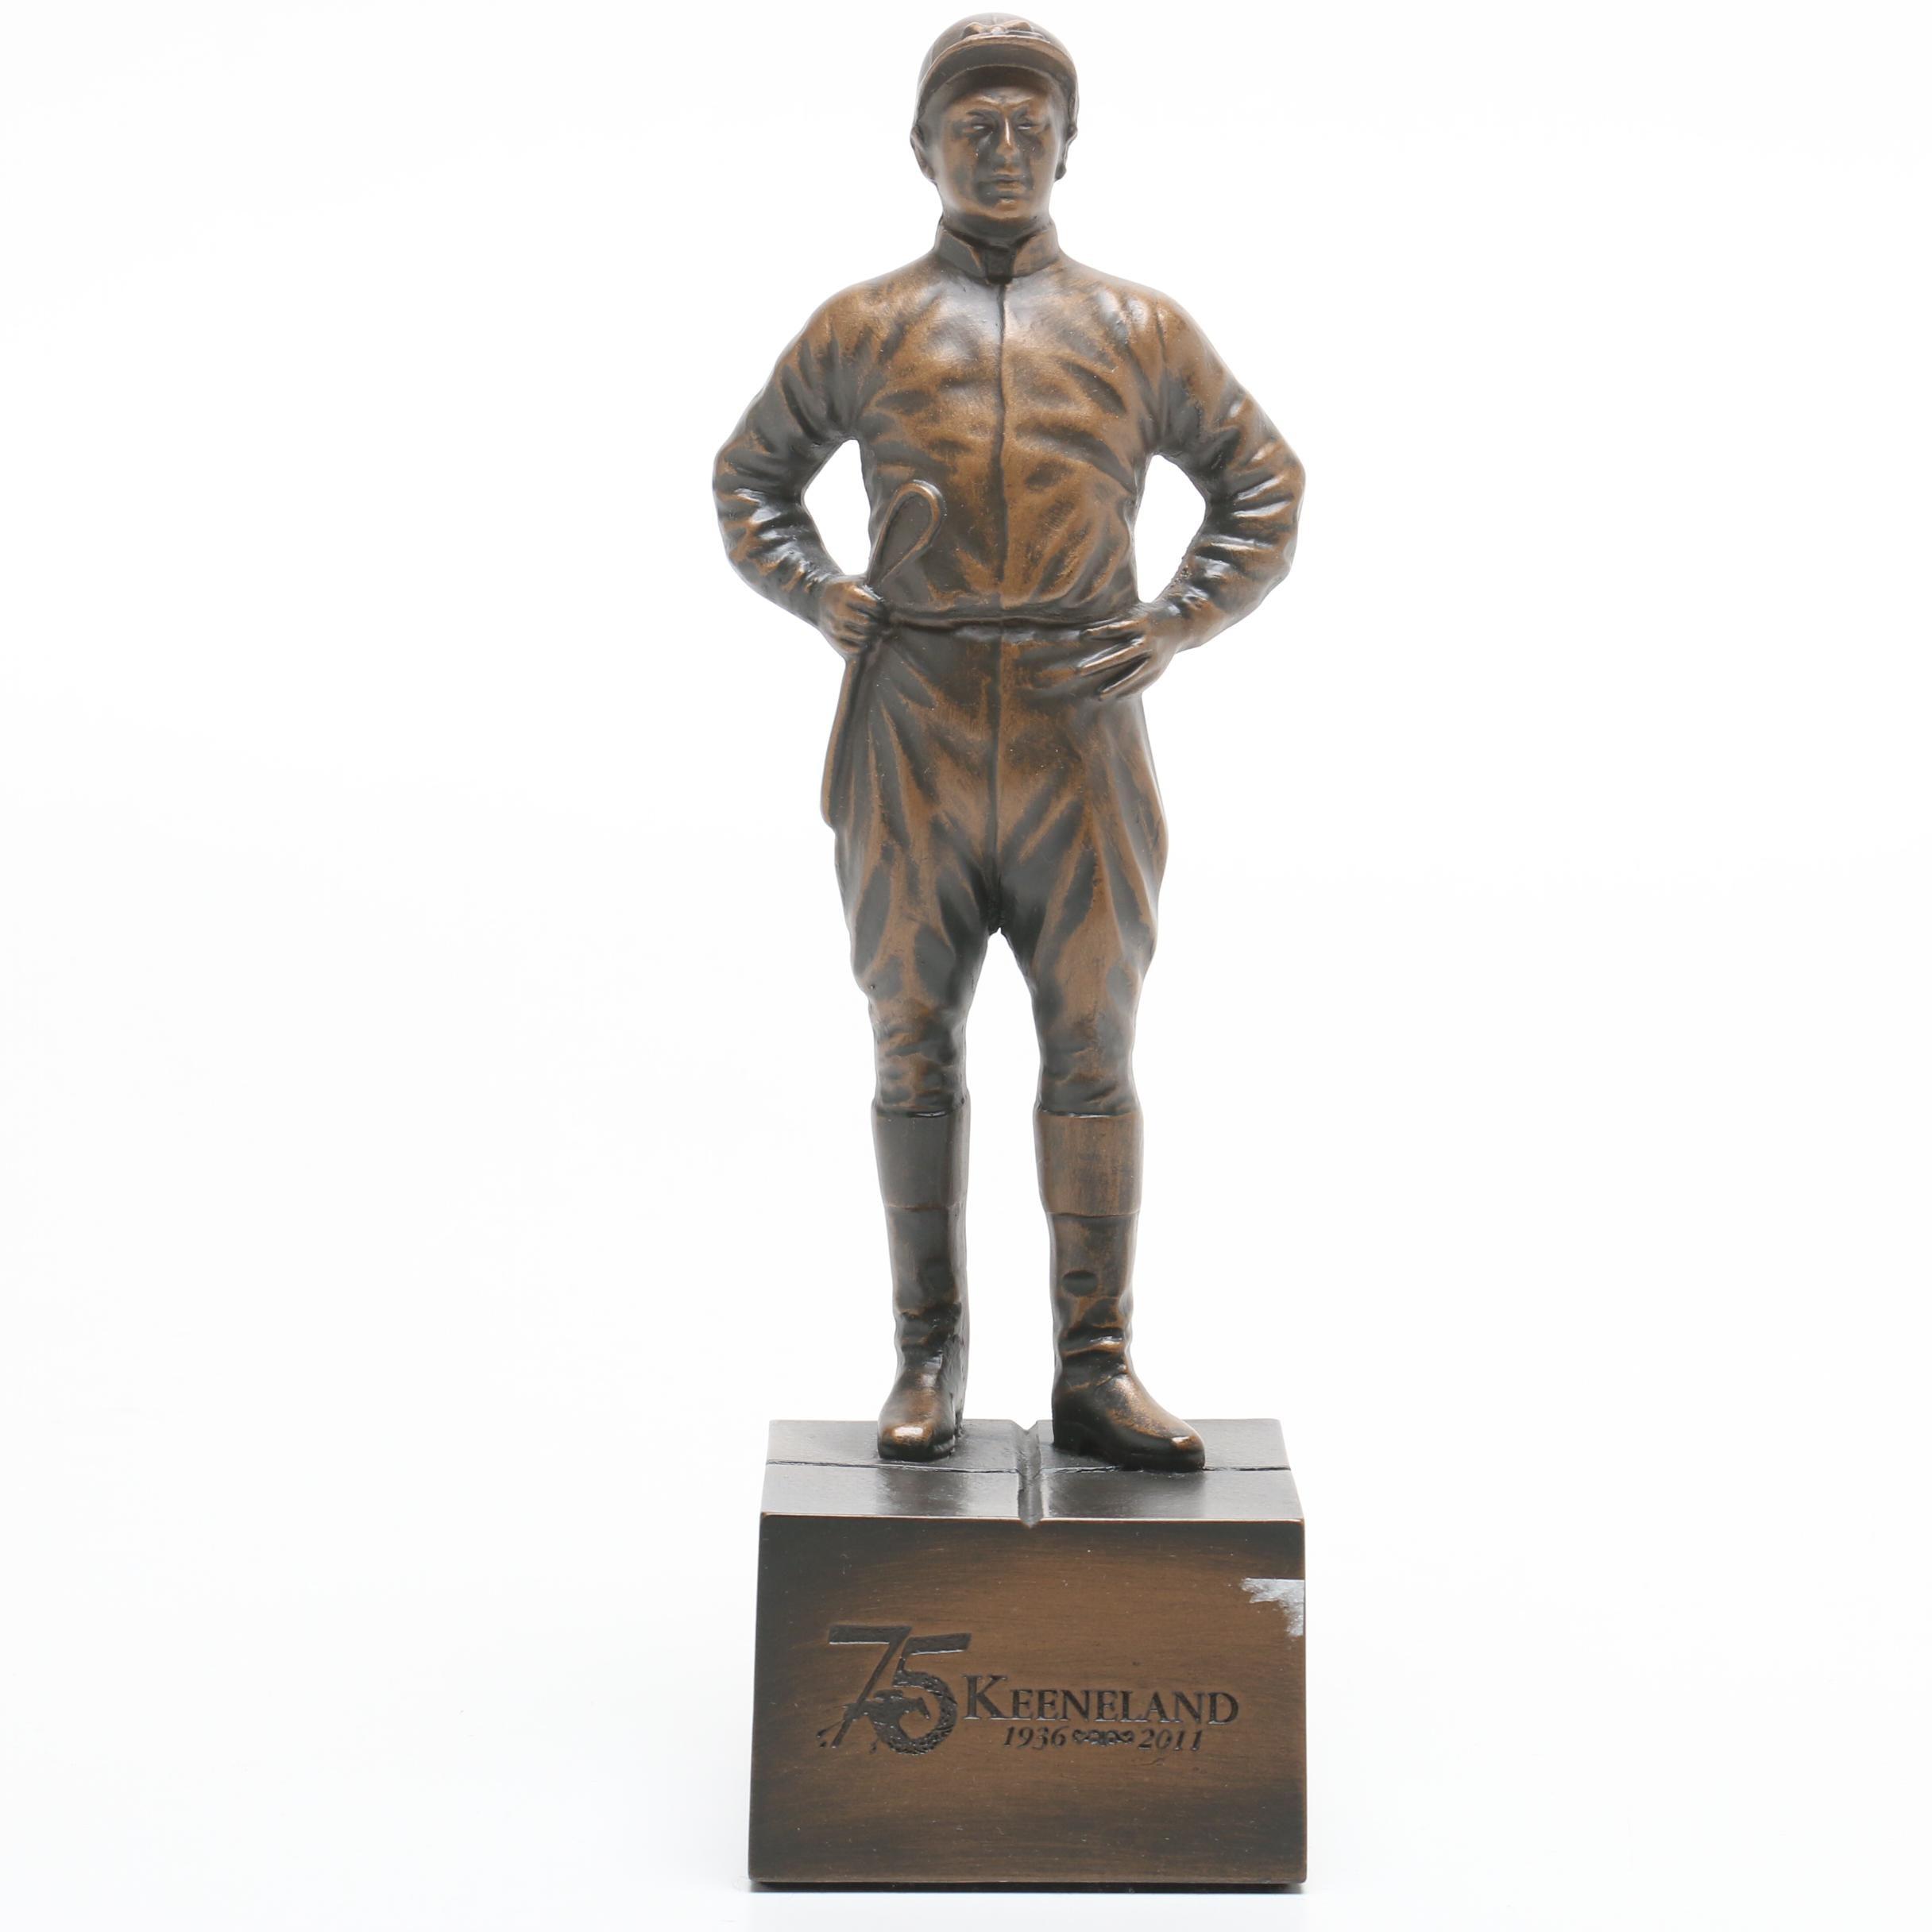 "Commemorative 2011 ""75th Anniversary"" Keeneland Race Track Jockey Statue"